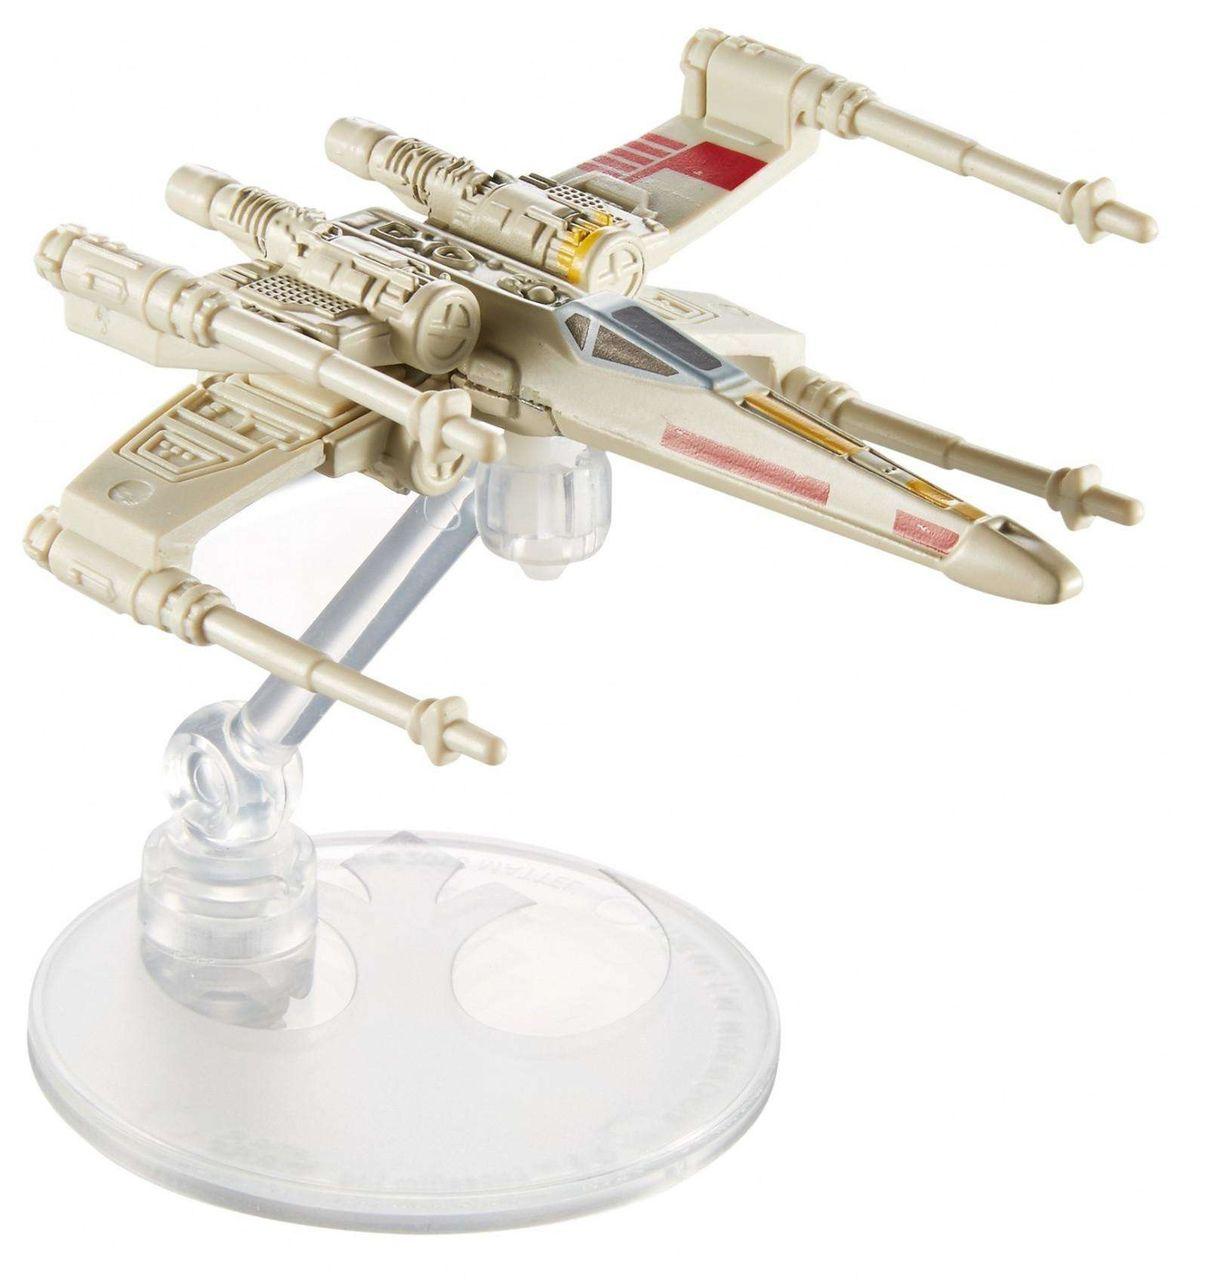 Hot Wheels X-Wing Fighter Red Five Vehicle: Star Wars - Mattel (Apenas Venda Online)